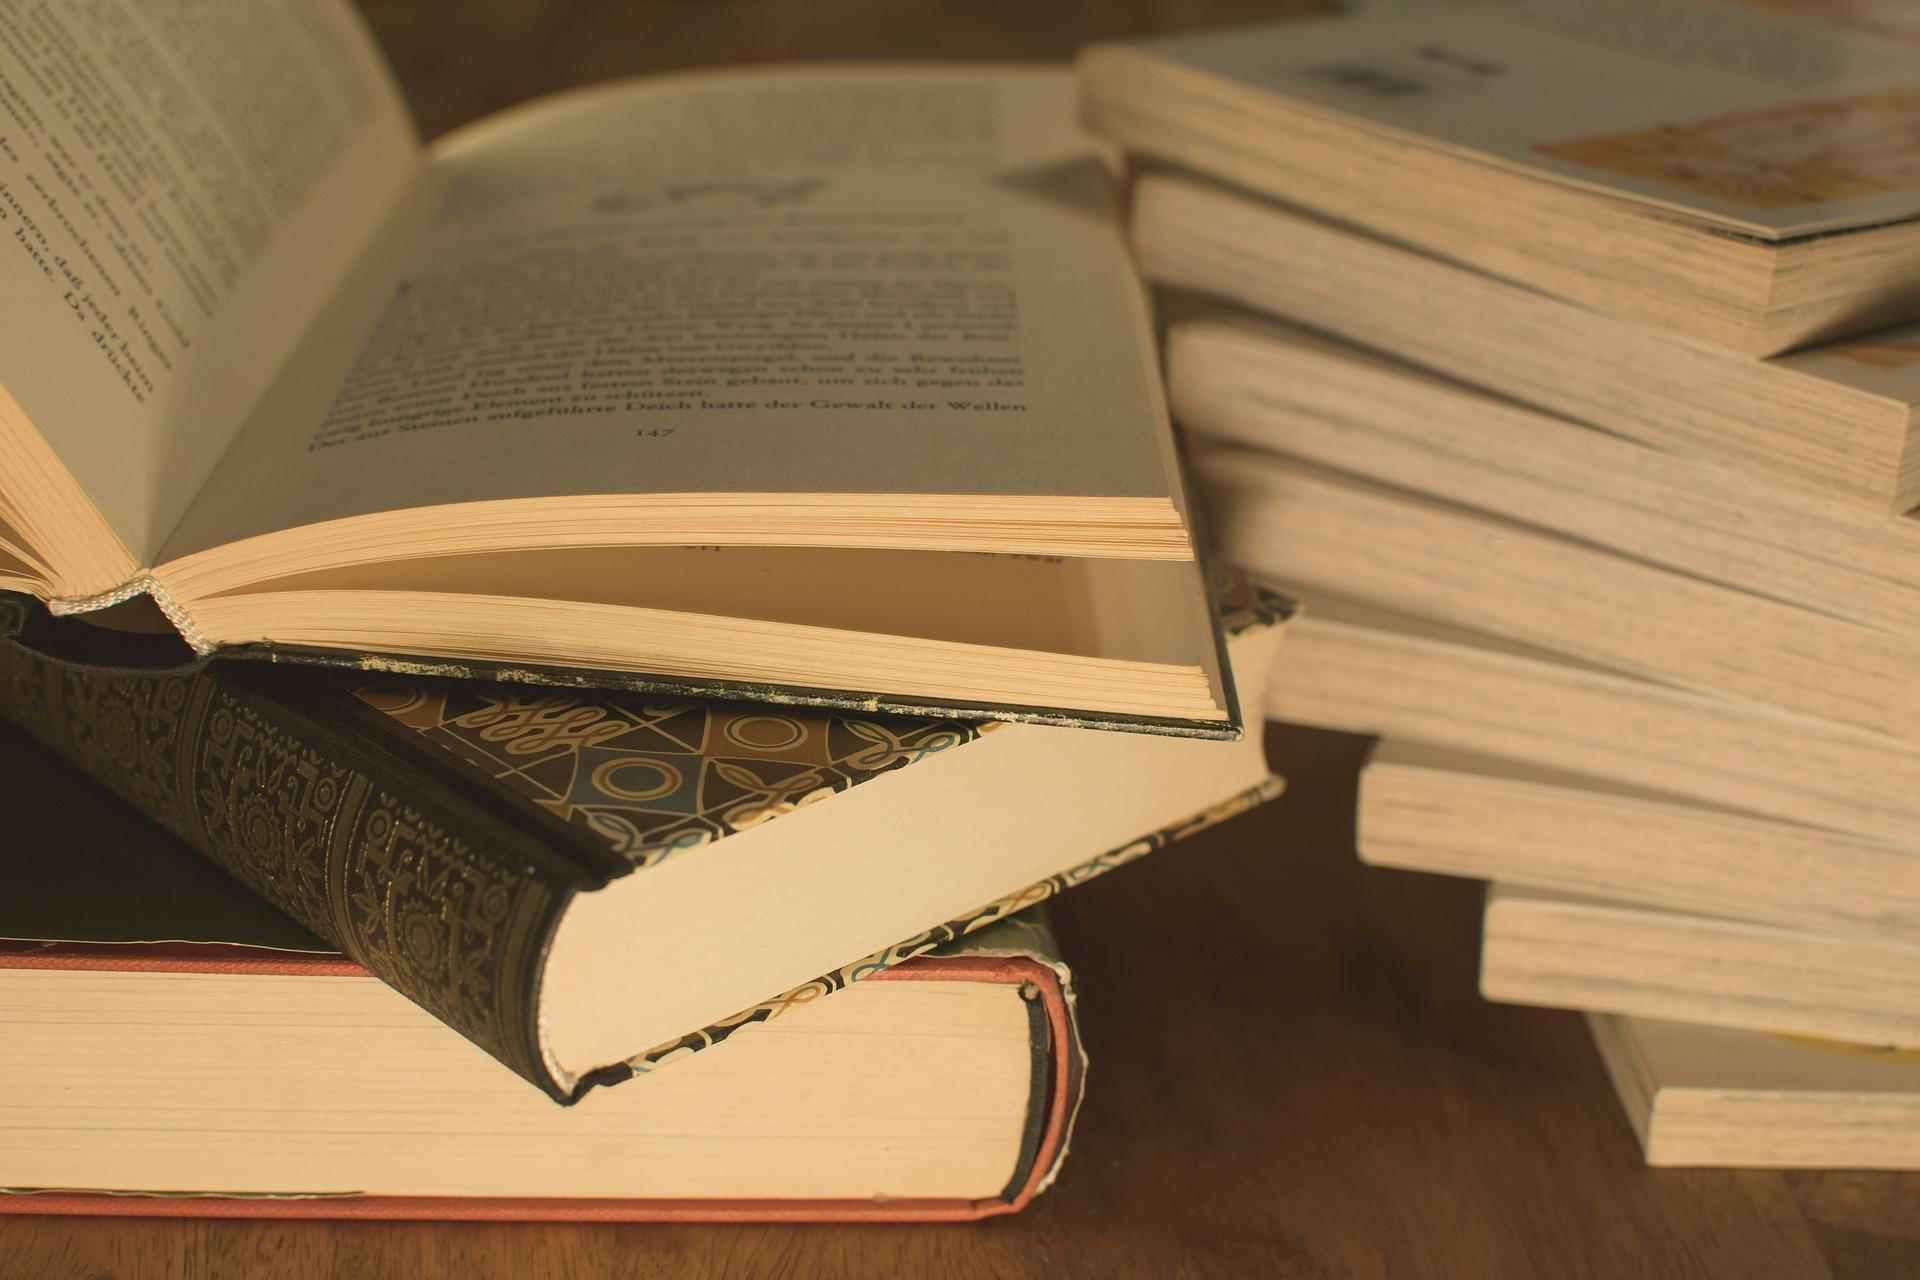 Scholarly books